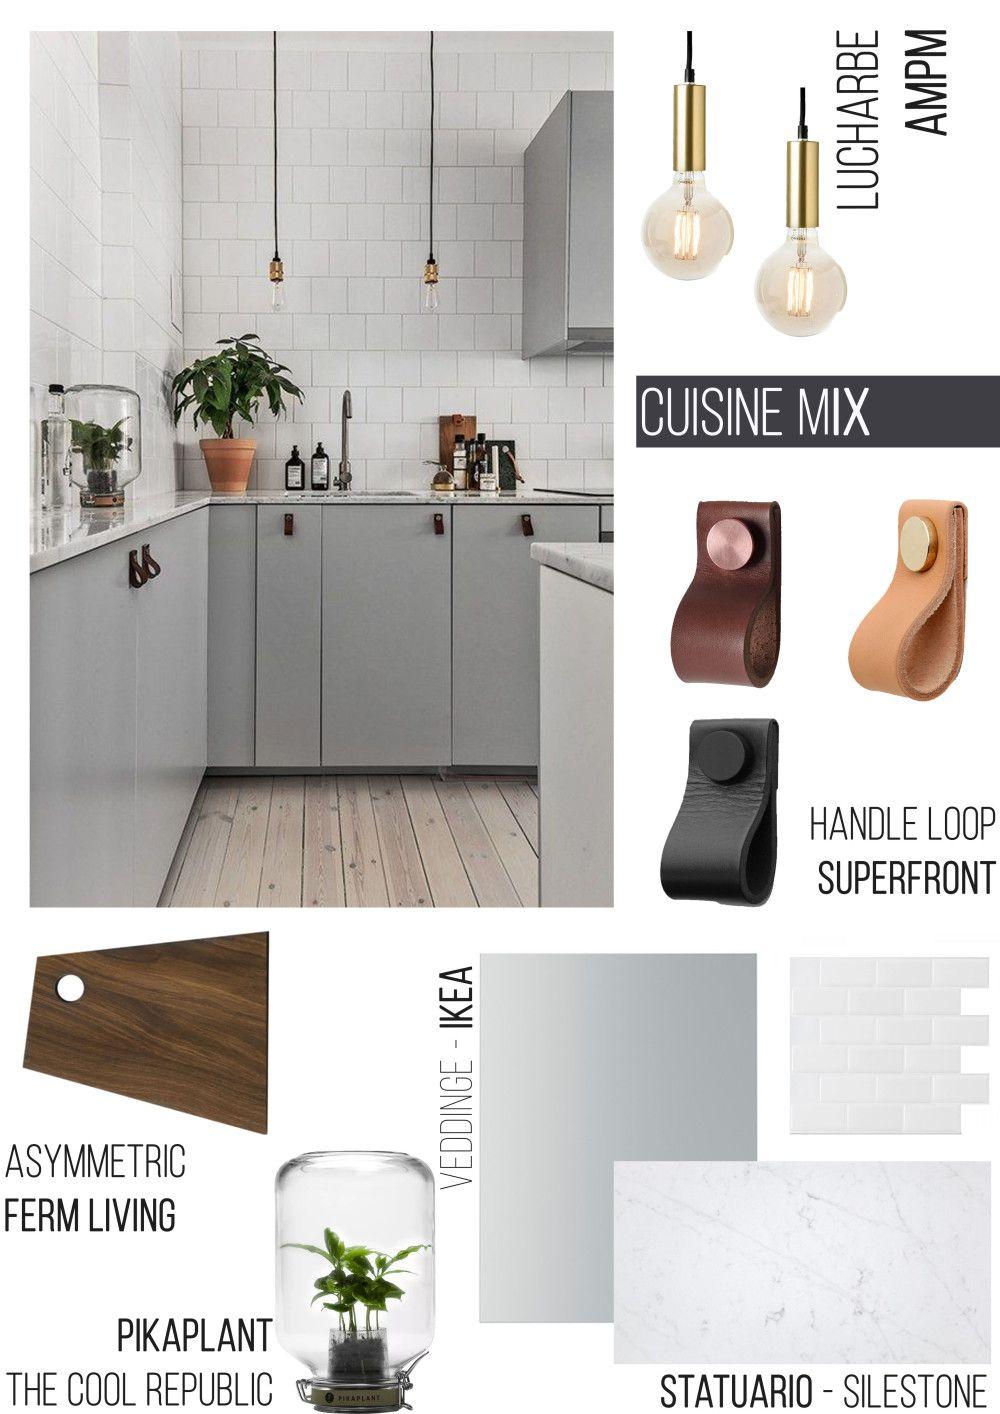 Kitchen Time Poignee Meuble Cuisine Cuisine Ikea Grise Meuble Cuisine